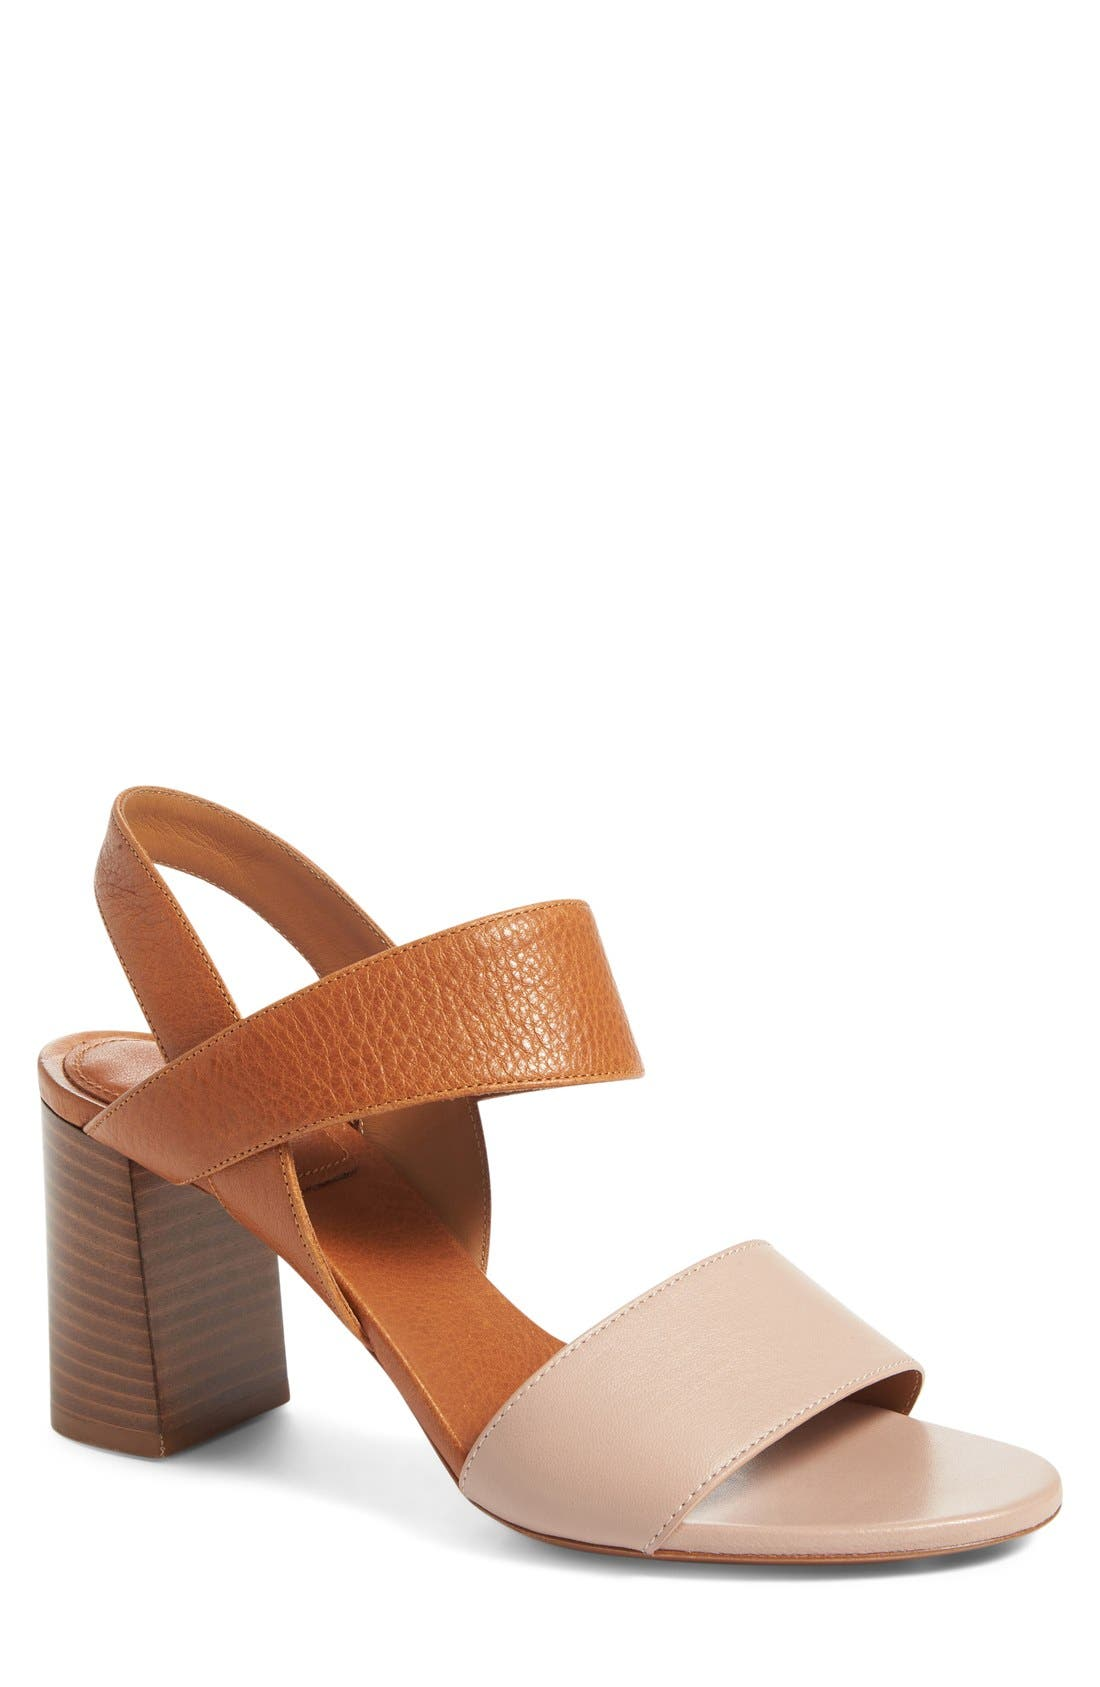 Main Image - Chloé Mia Block Heel Sandal (Women)